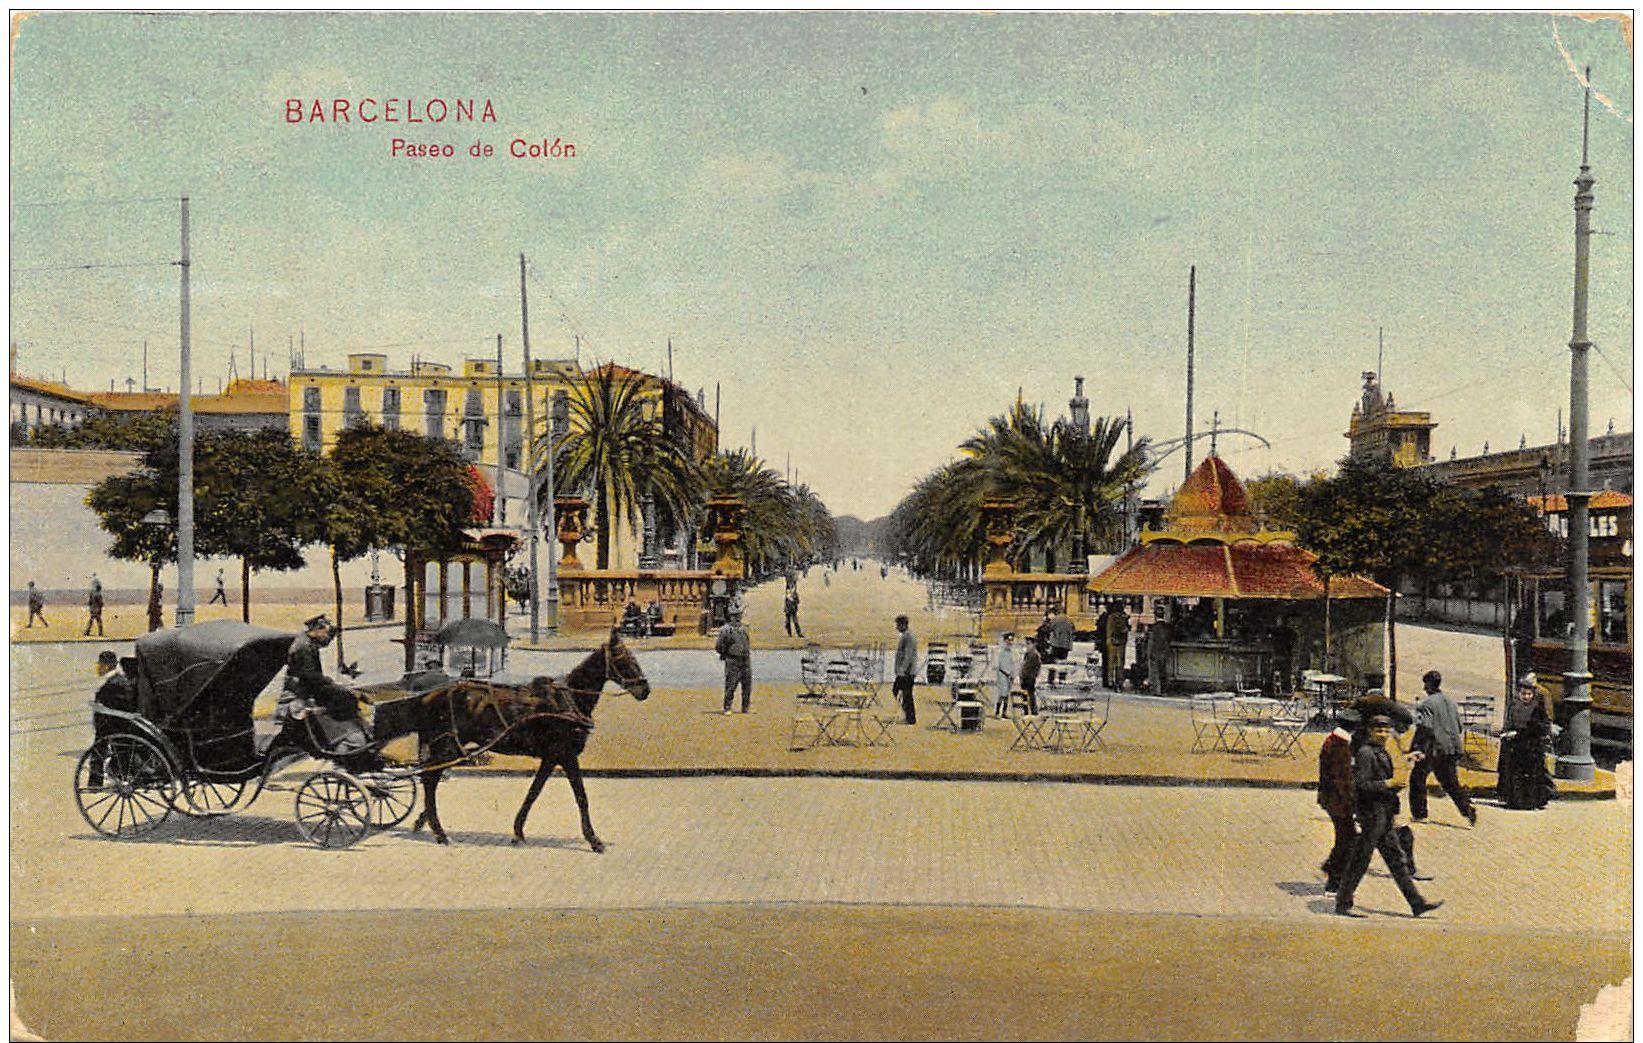 Barcelona - Anim. Attelage - Paseo De Colon - Barcelona